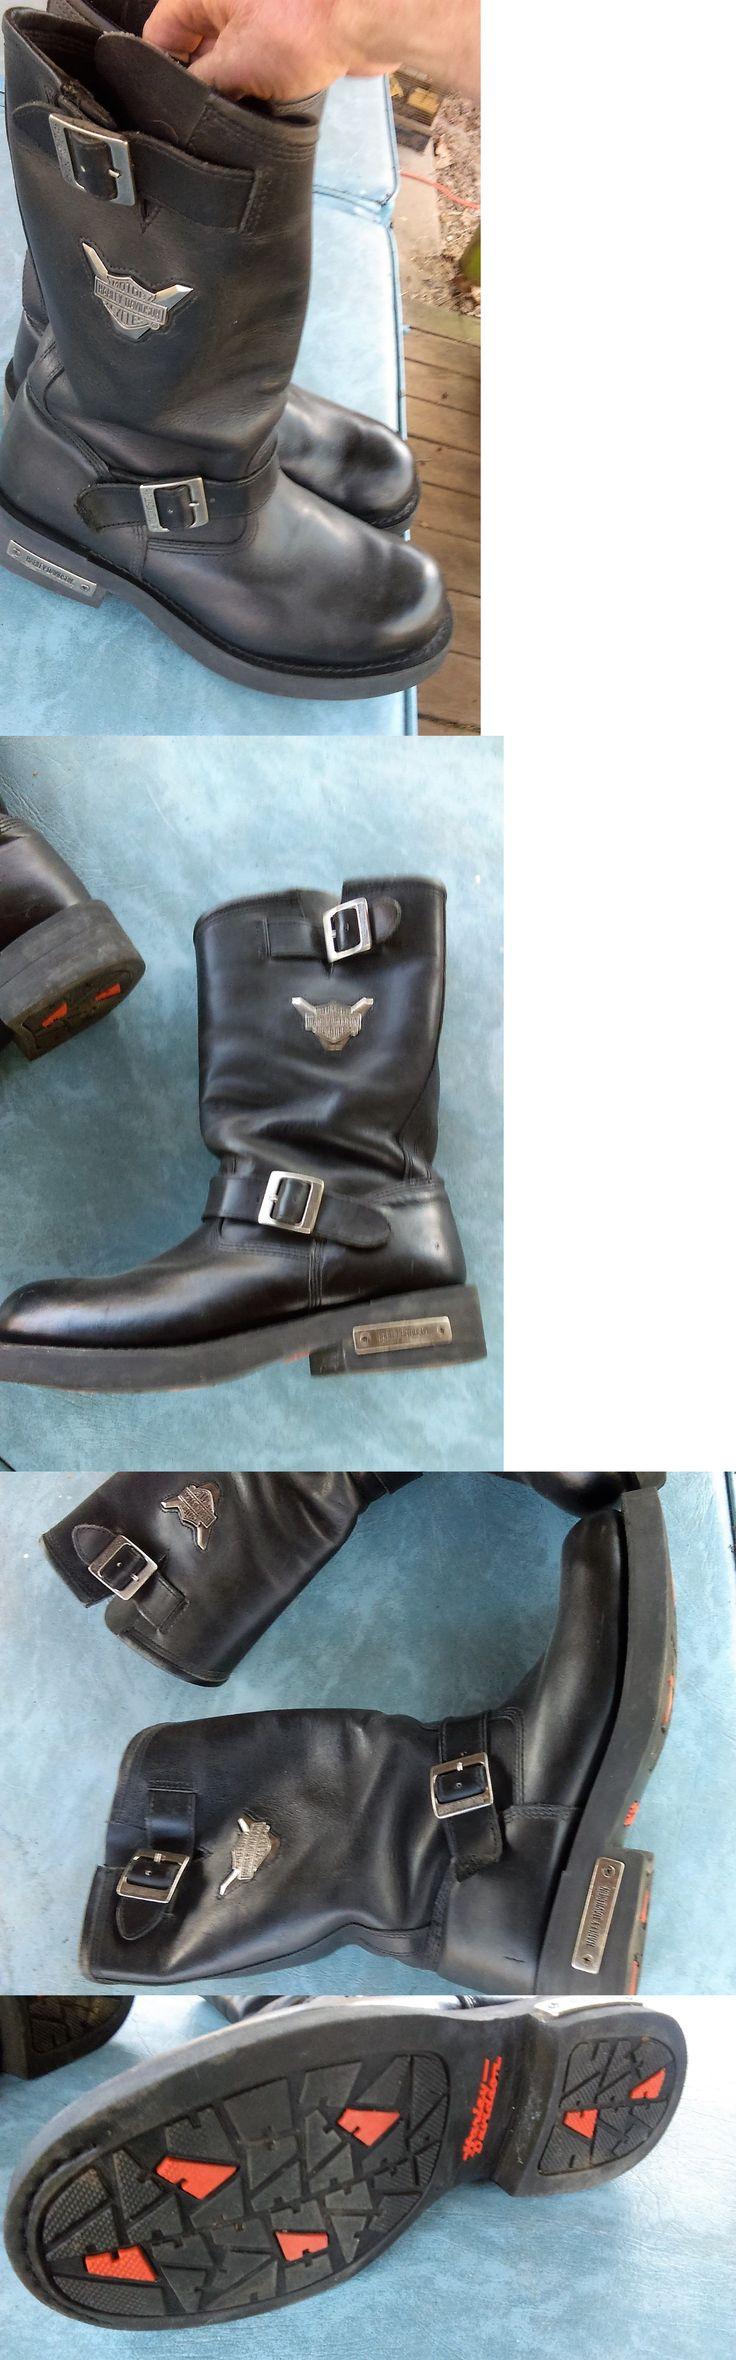 Motorcycles: Harley Davidson Motorcycle Boots 91135 Size 12 -> BUY IT NOW  ONLY: · Harley Davidson Motorcycle BootsSize 12Men's Fashion